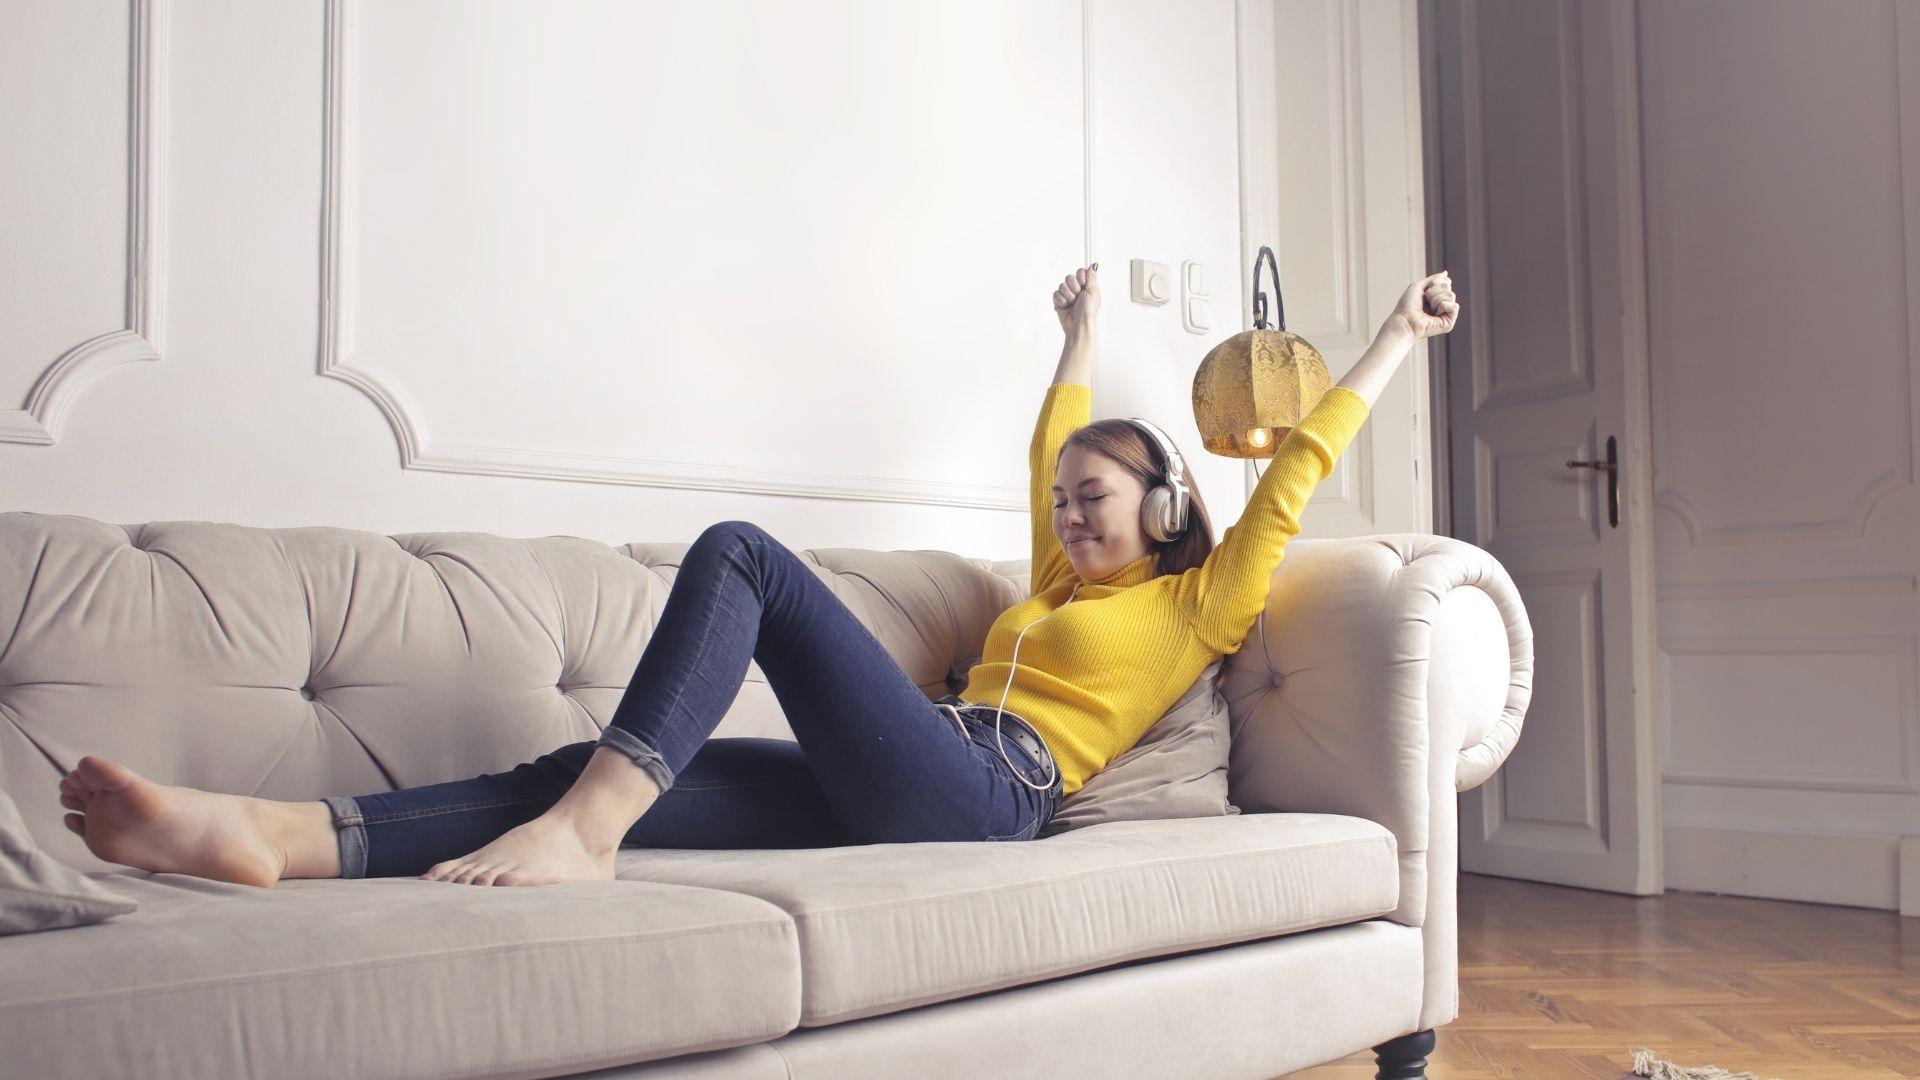 Entspannung - Musik hören